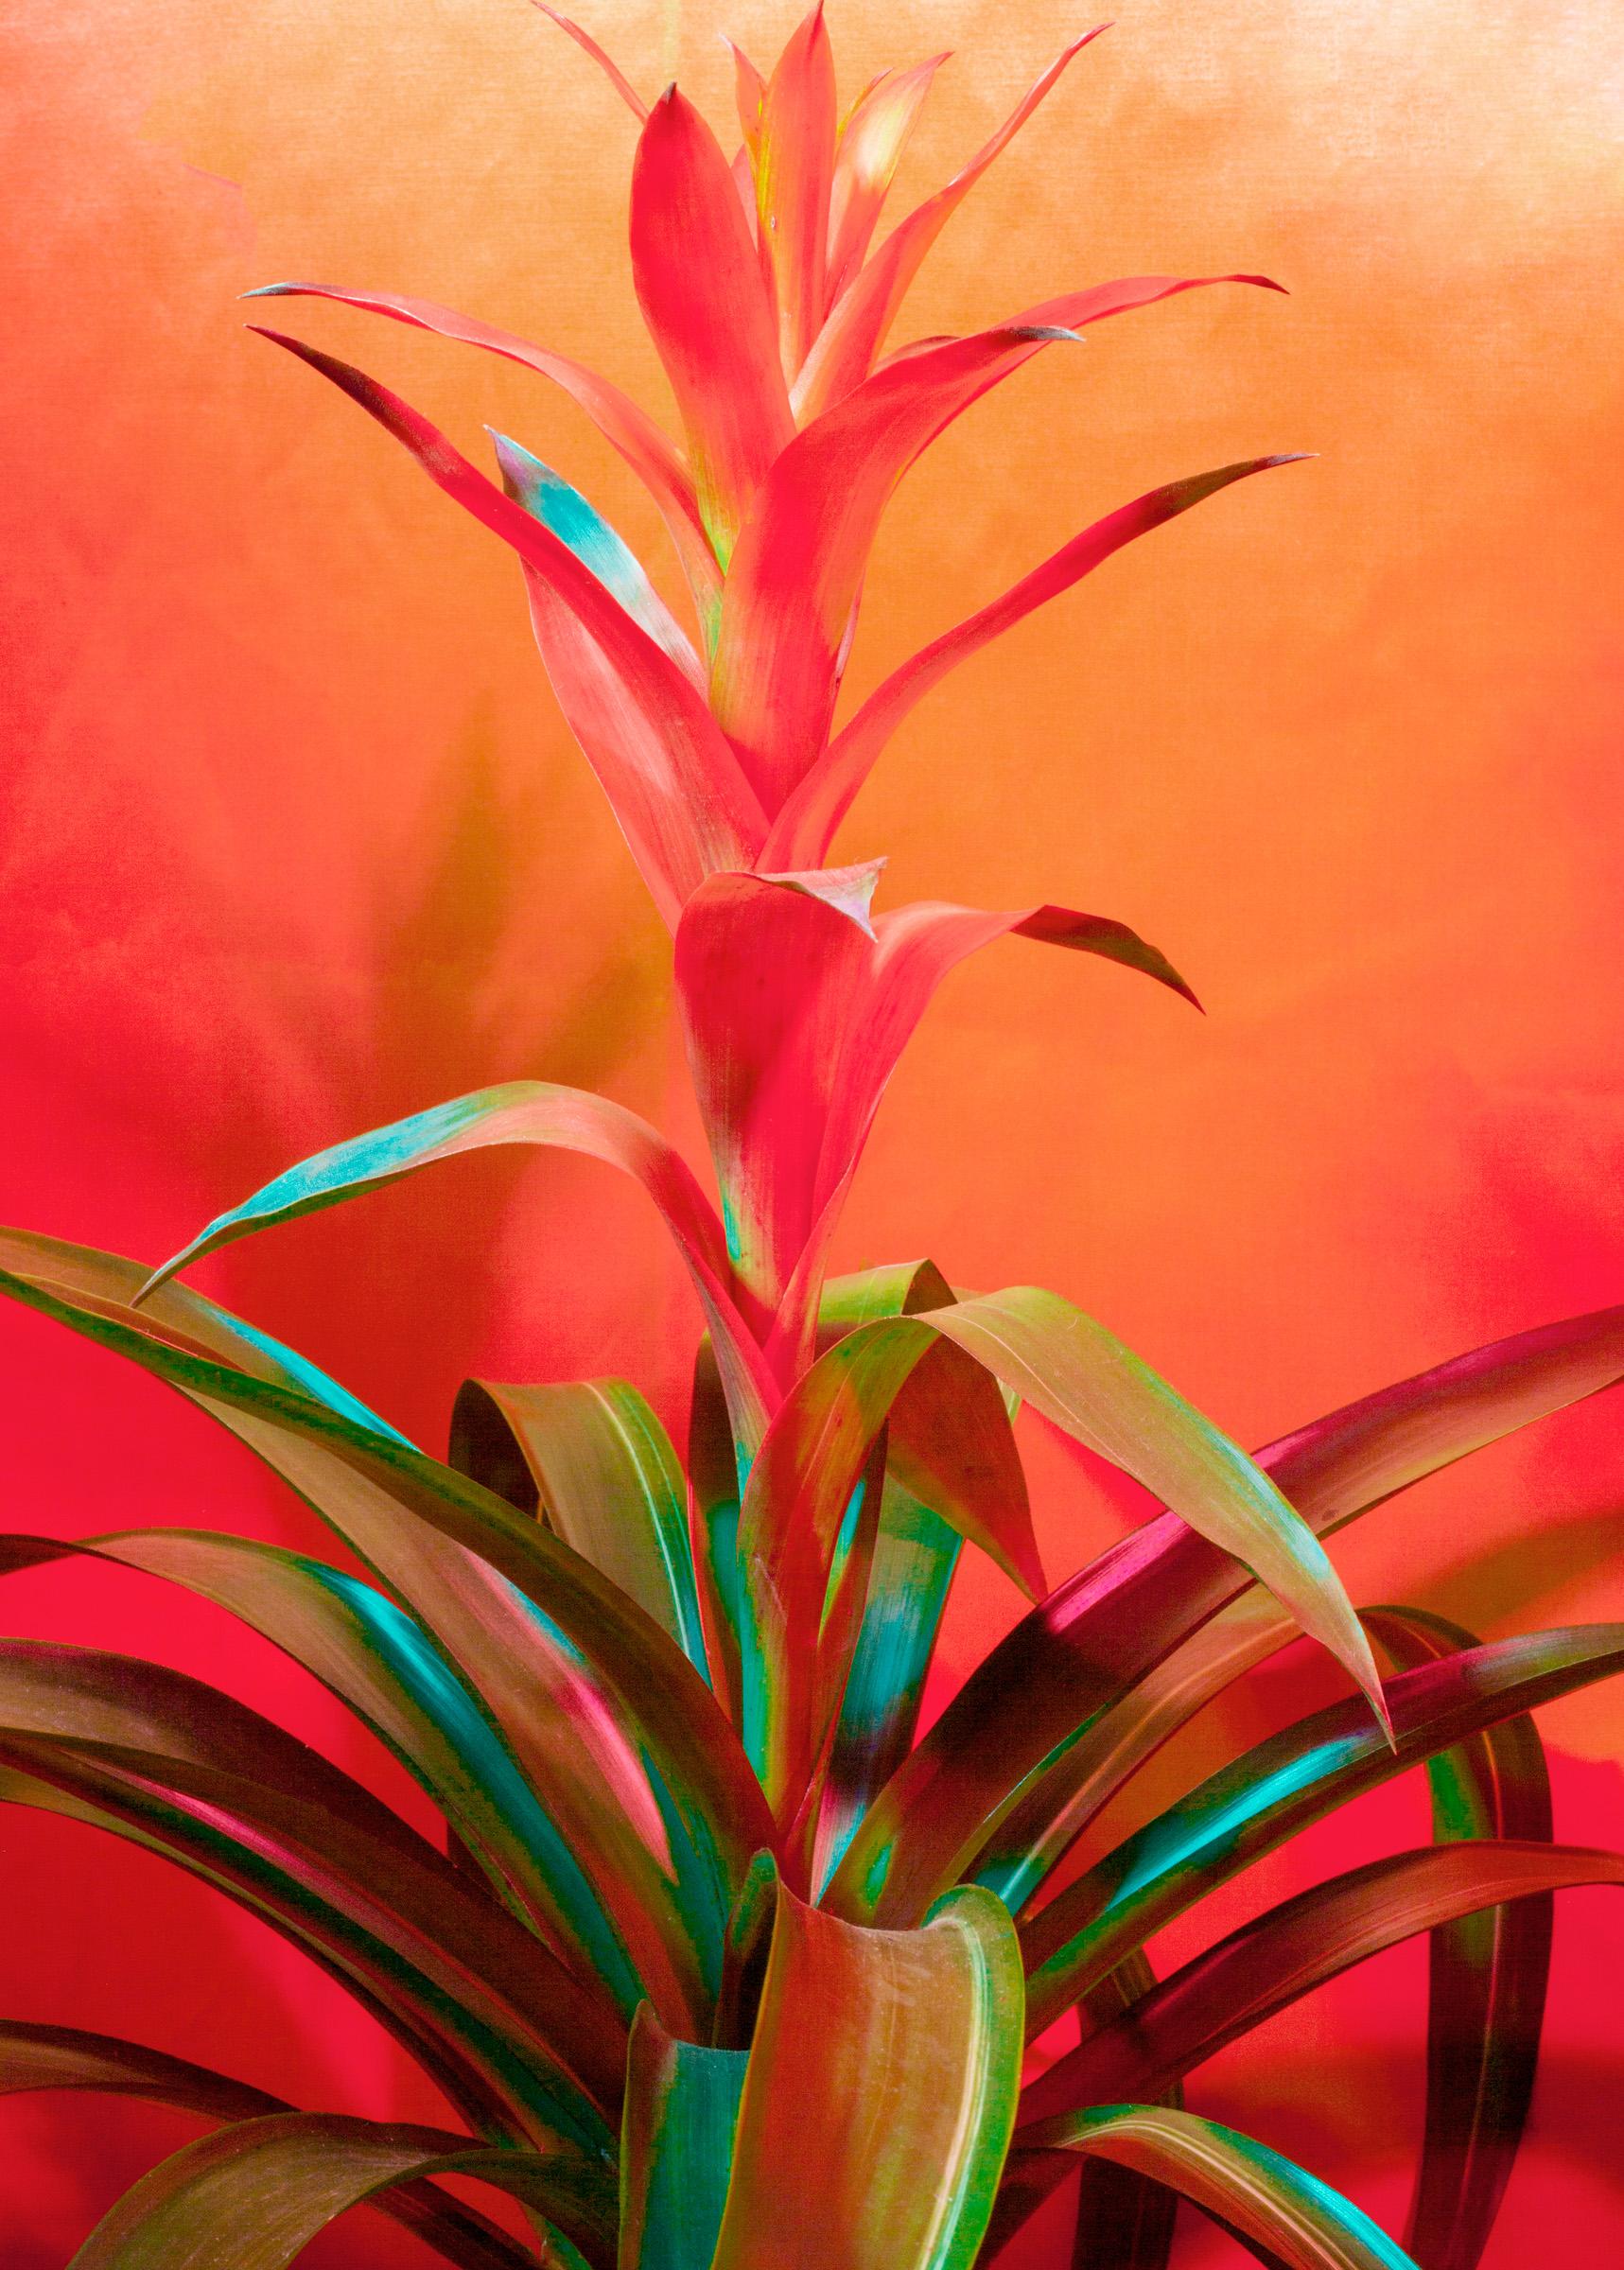 Dainesha Nugent-Palache, Untitled (Bromeliads), 2020. Courtesy of the artist